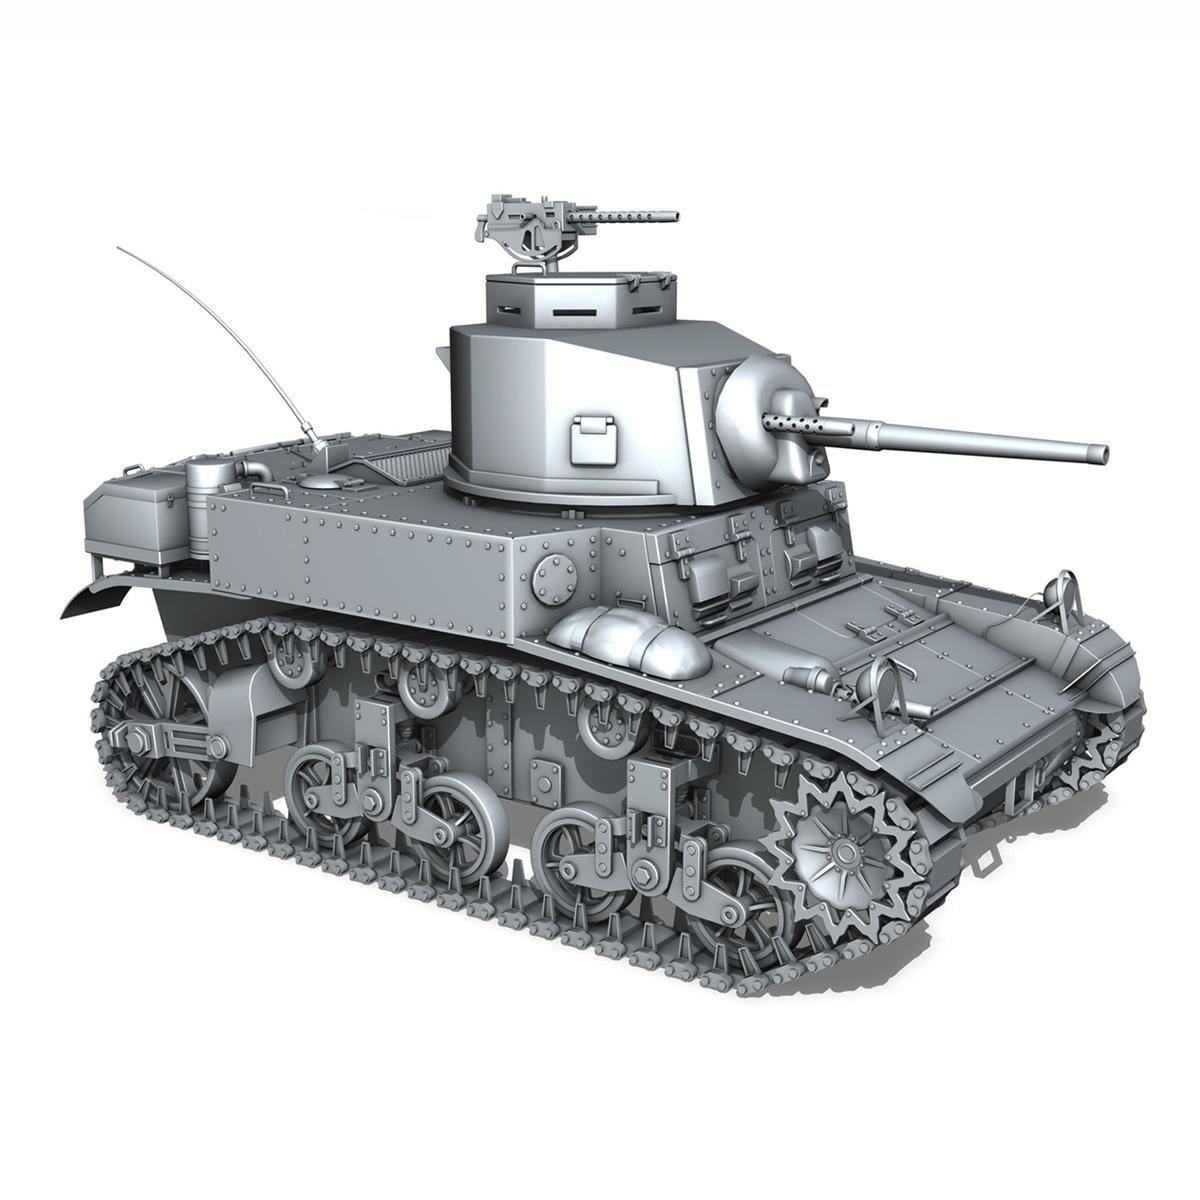 m3 light tank stuart – early production 3d model 3ds fbx c4d lwo obj 189175